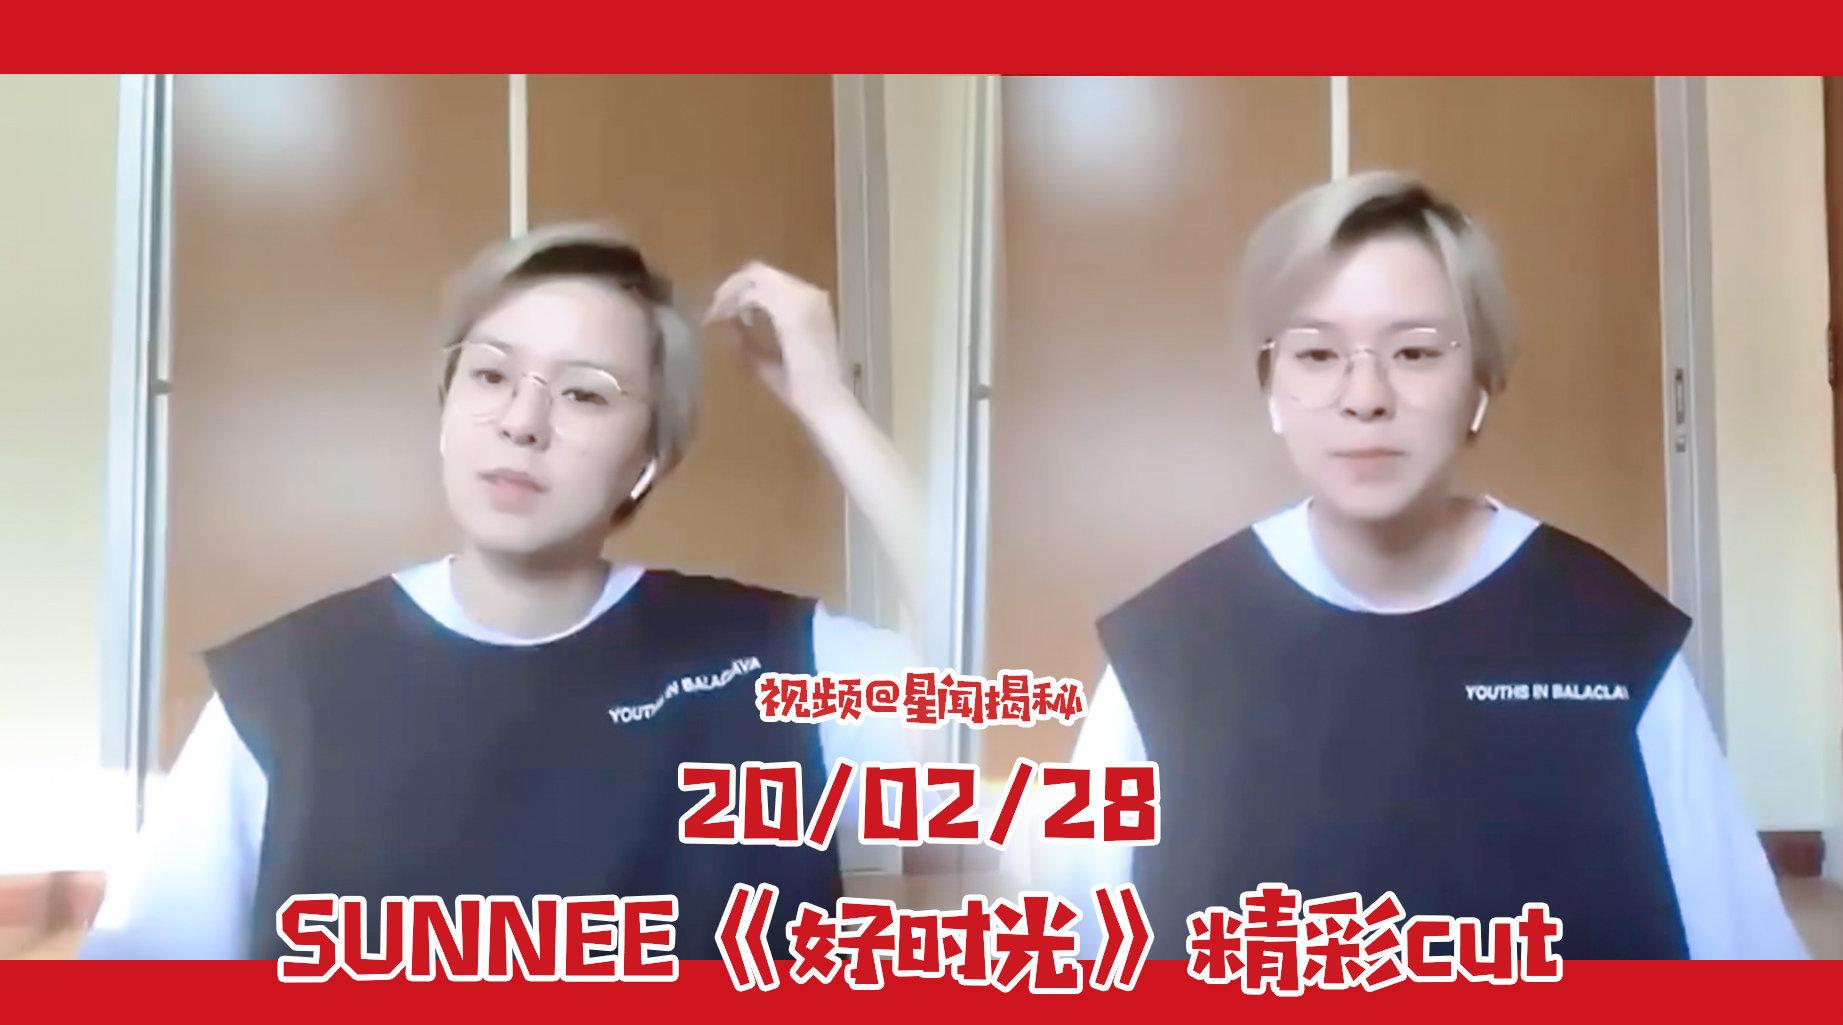 Sunnee杨芸晴《不哭》 Sunnee直播单人cut在线模仿哆啦A梦+想要能看